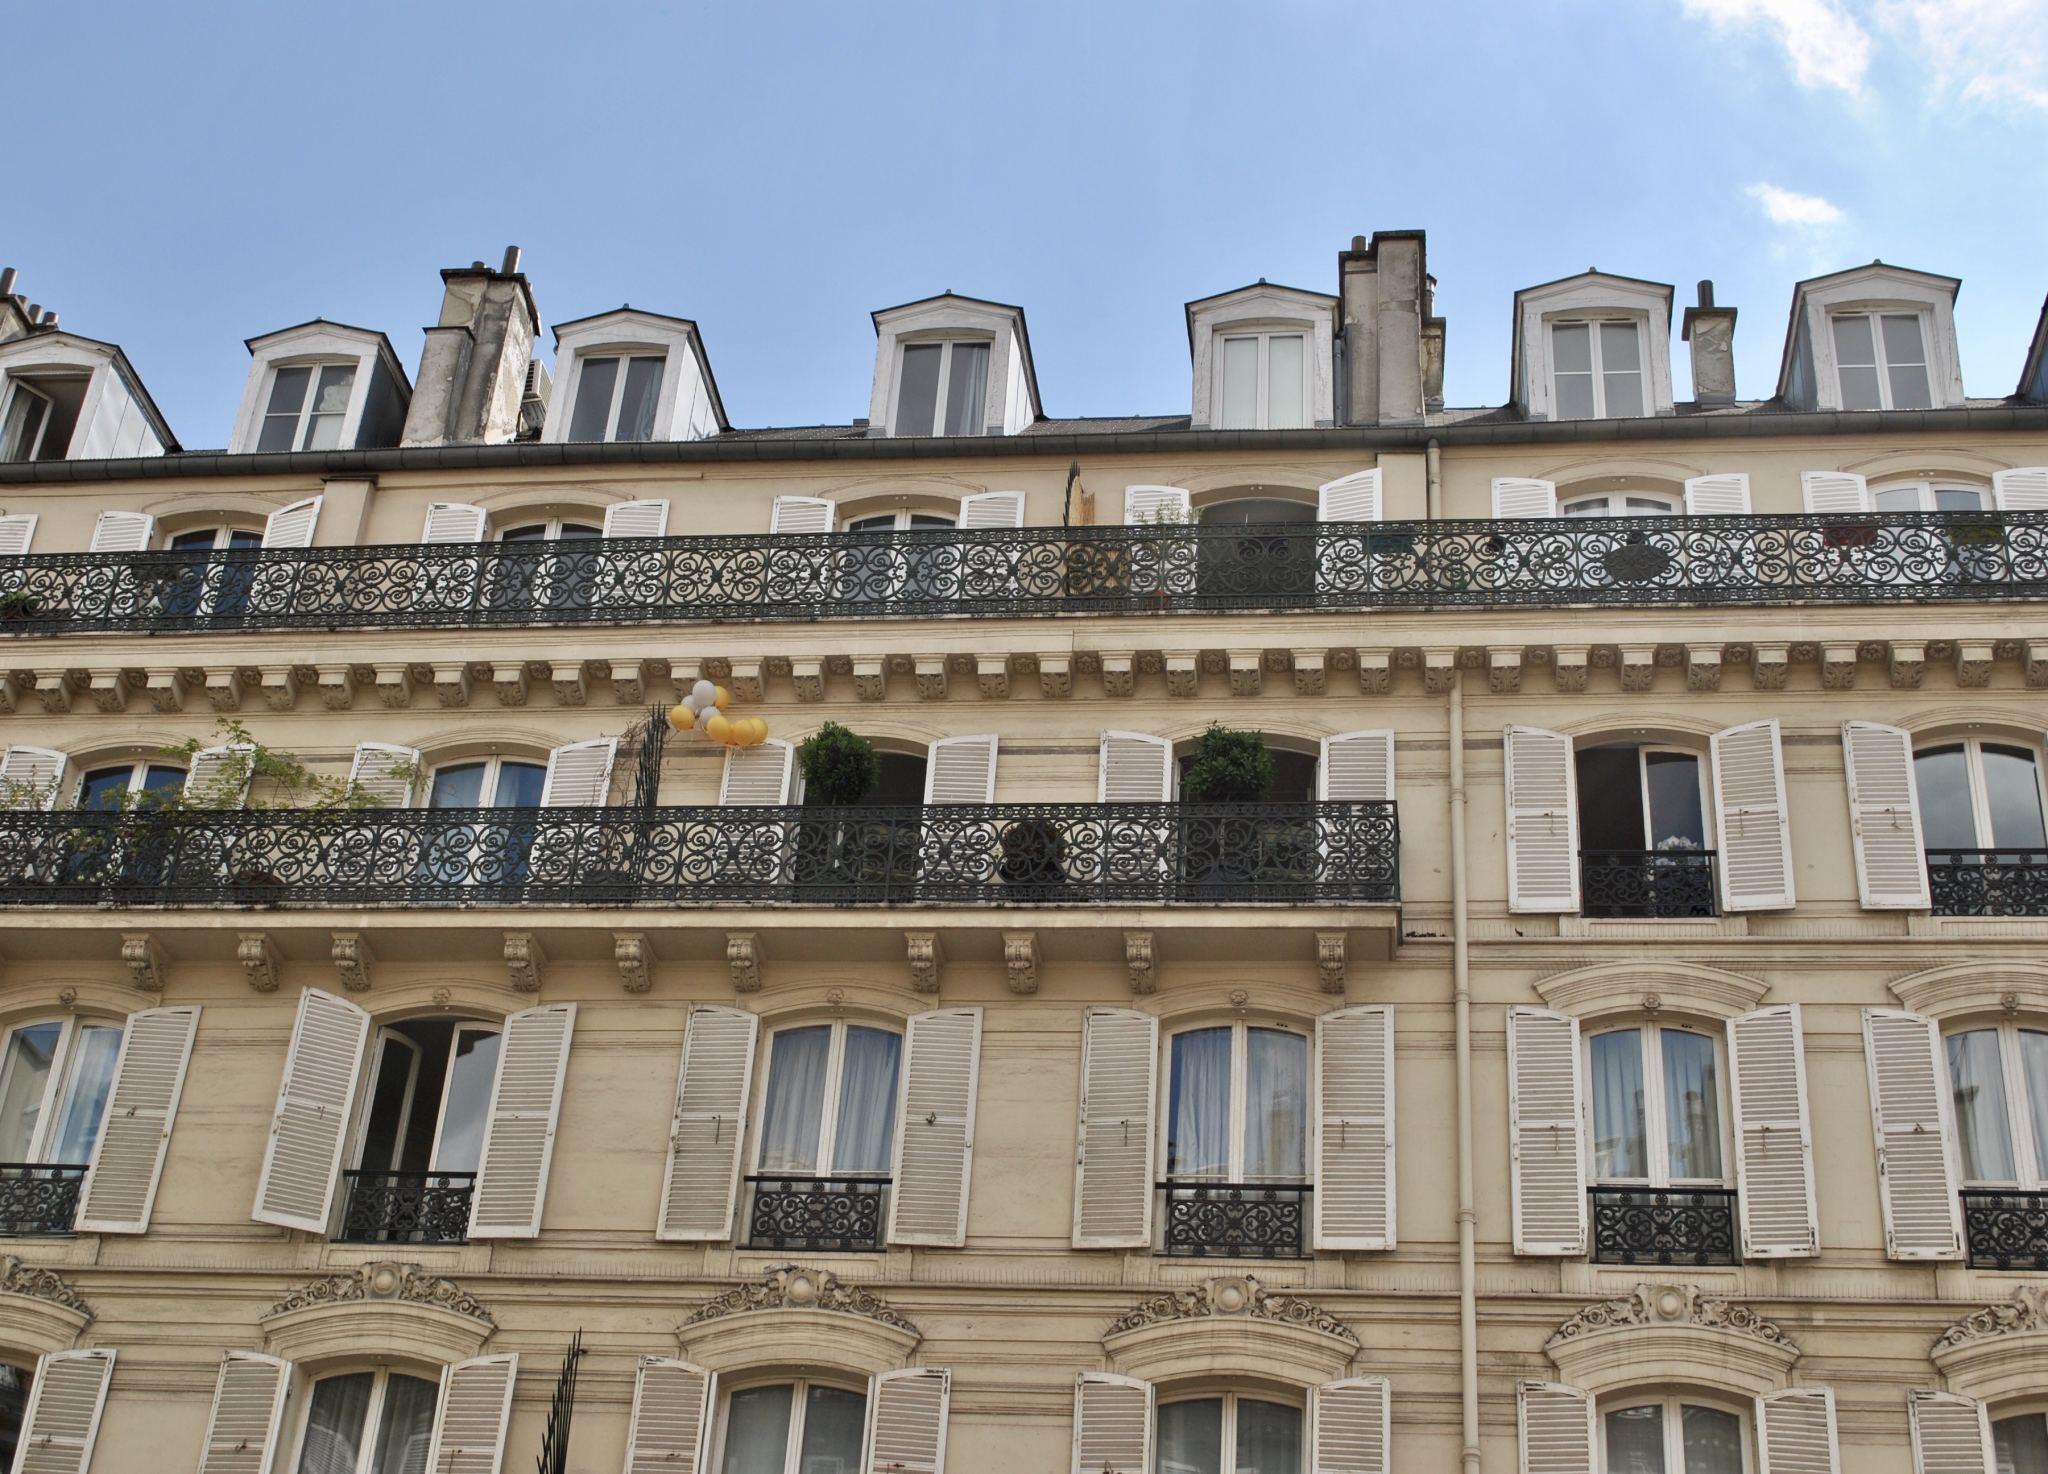 Window shutters and pretty balconies